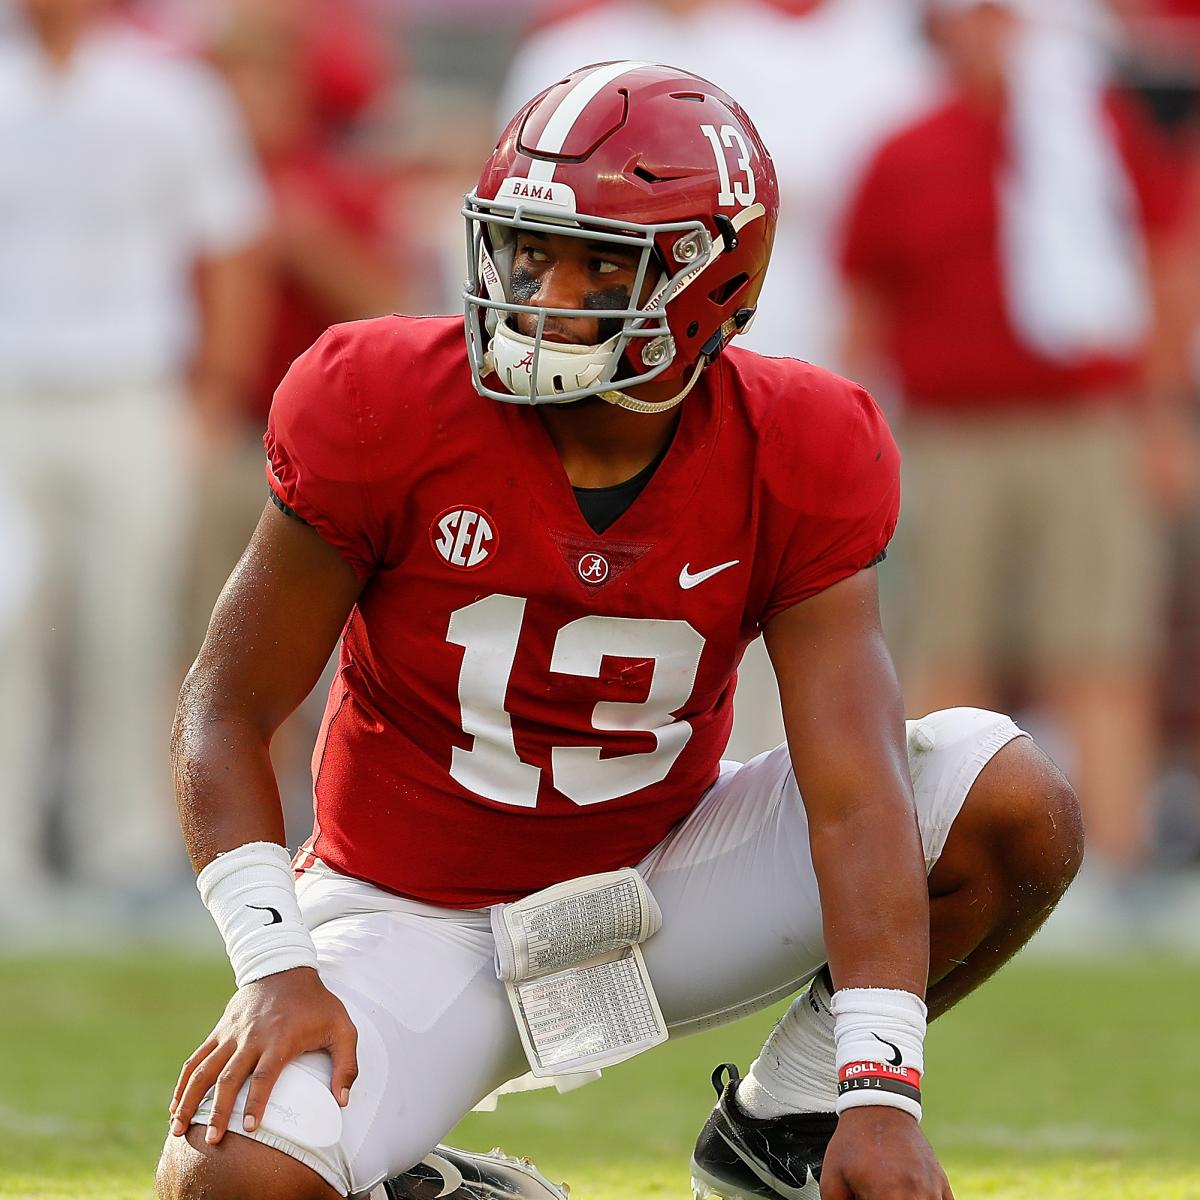 Alabama ole miss line betting atletico nacional vs patriots win sports betting